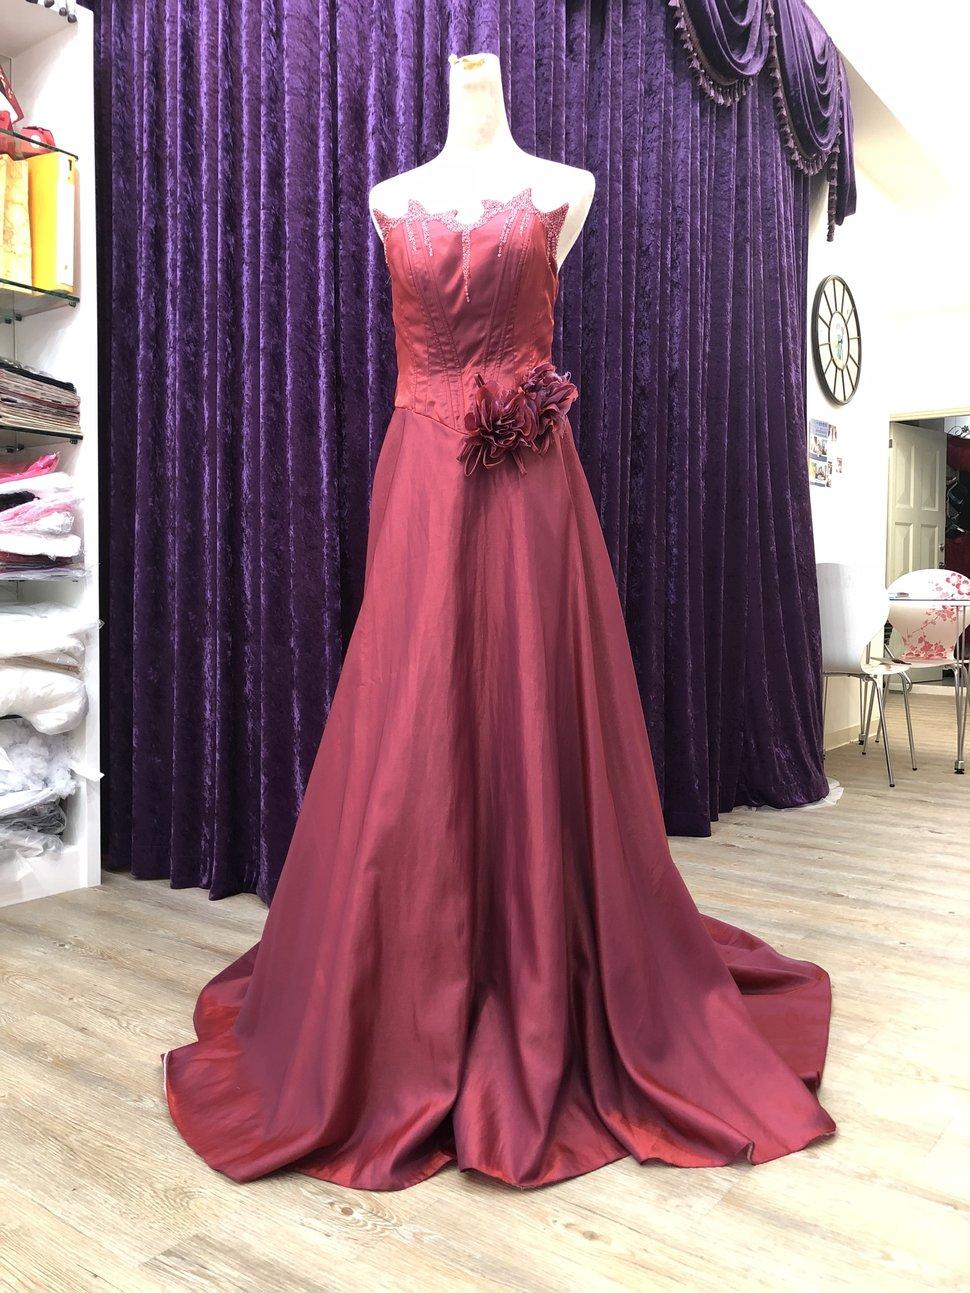 IMG_5229 - 全台最便宜-45DESIGN四五婚紗禮服《結婚吧》